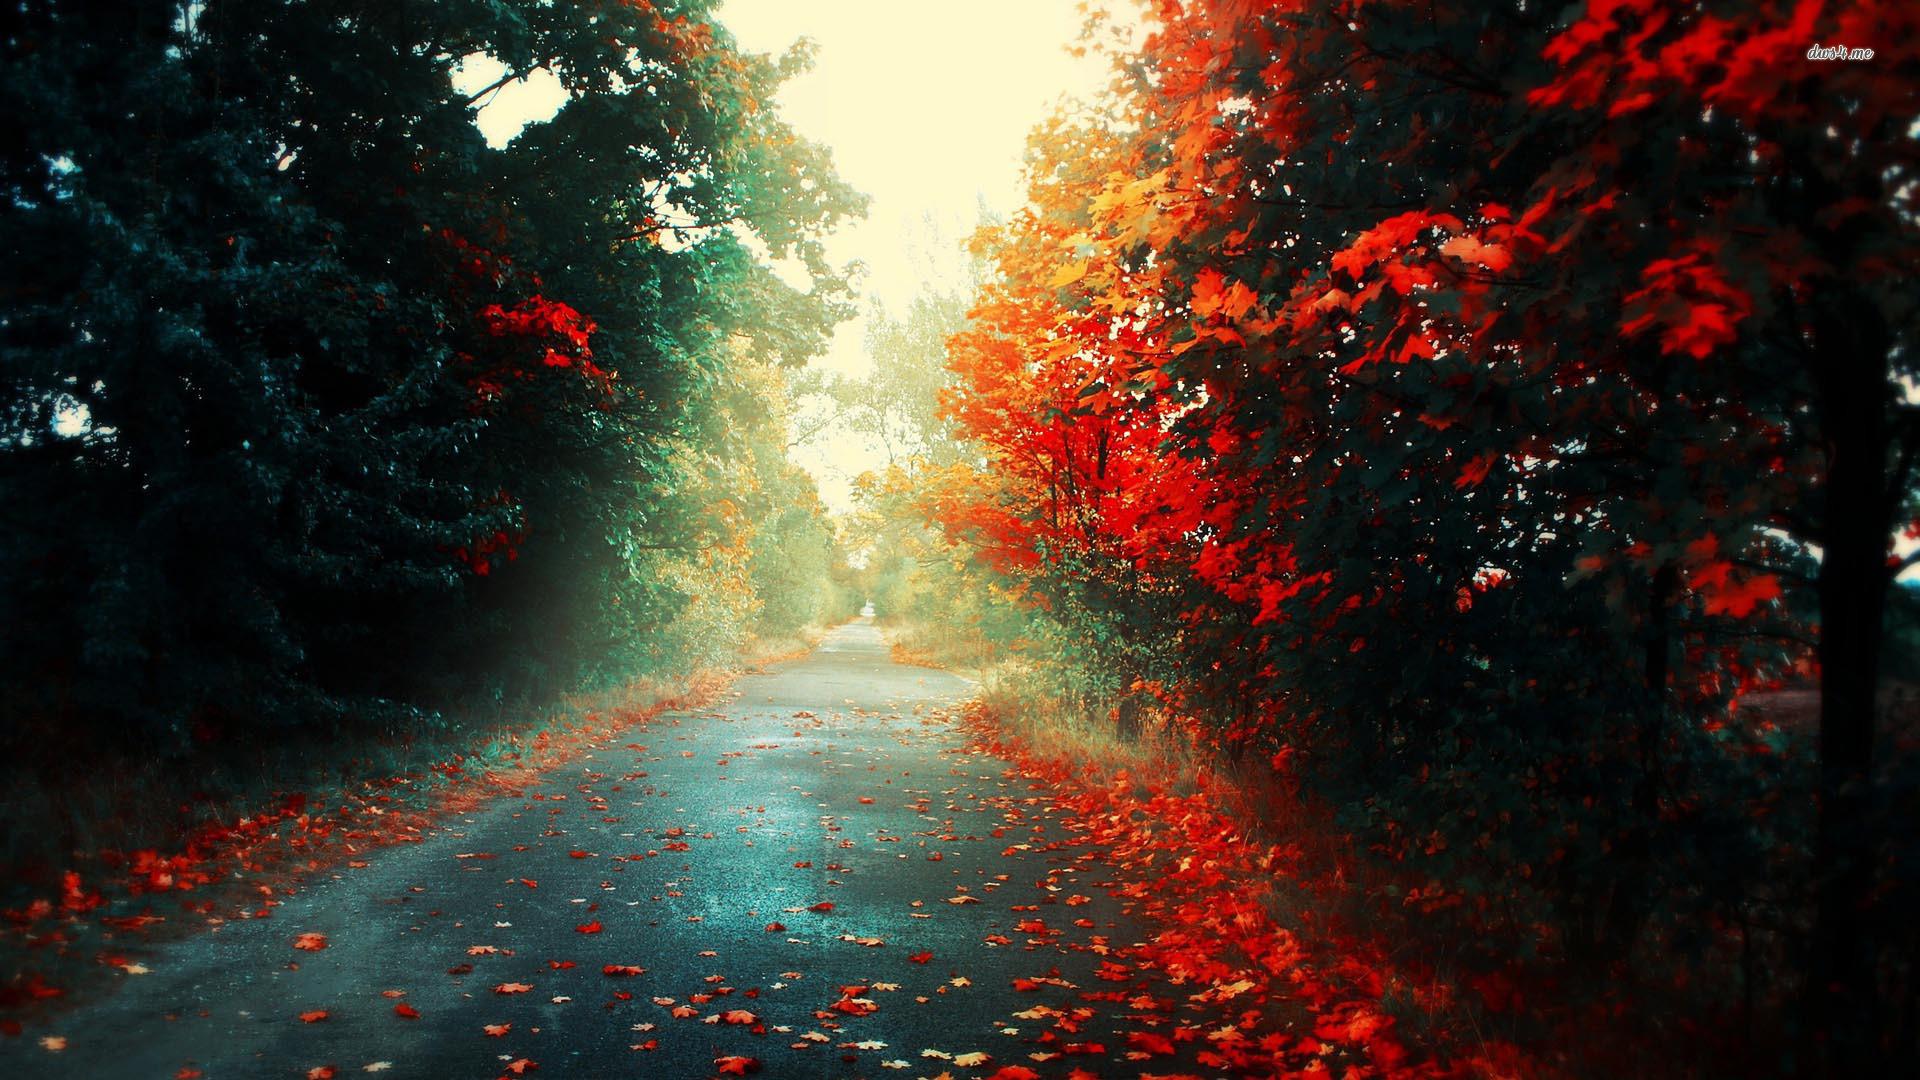 Top Beautiful Artistic Photos, 49-4K Ultra HD, SHunVMall com